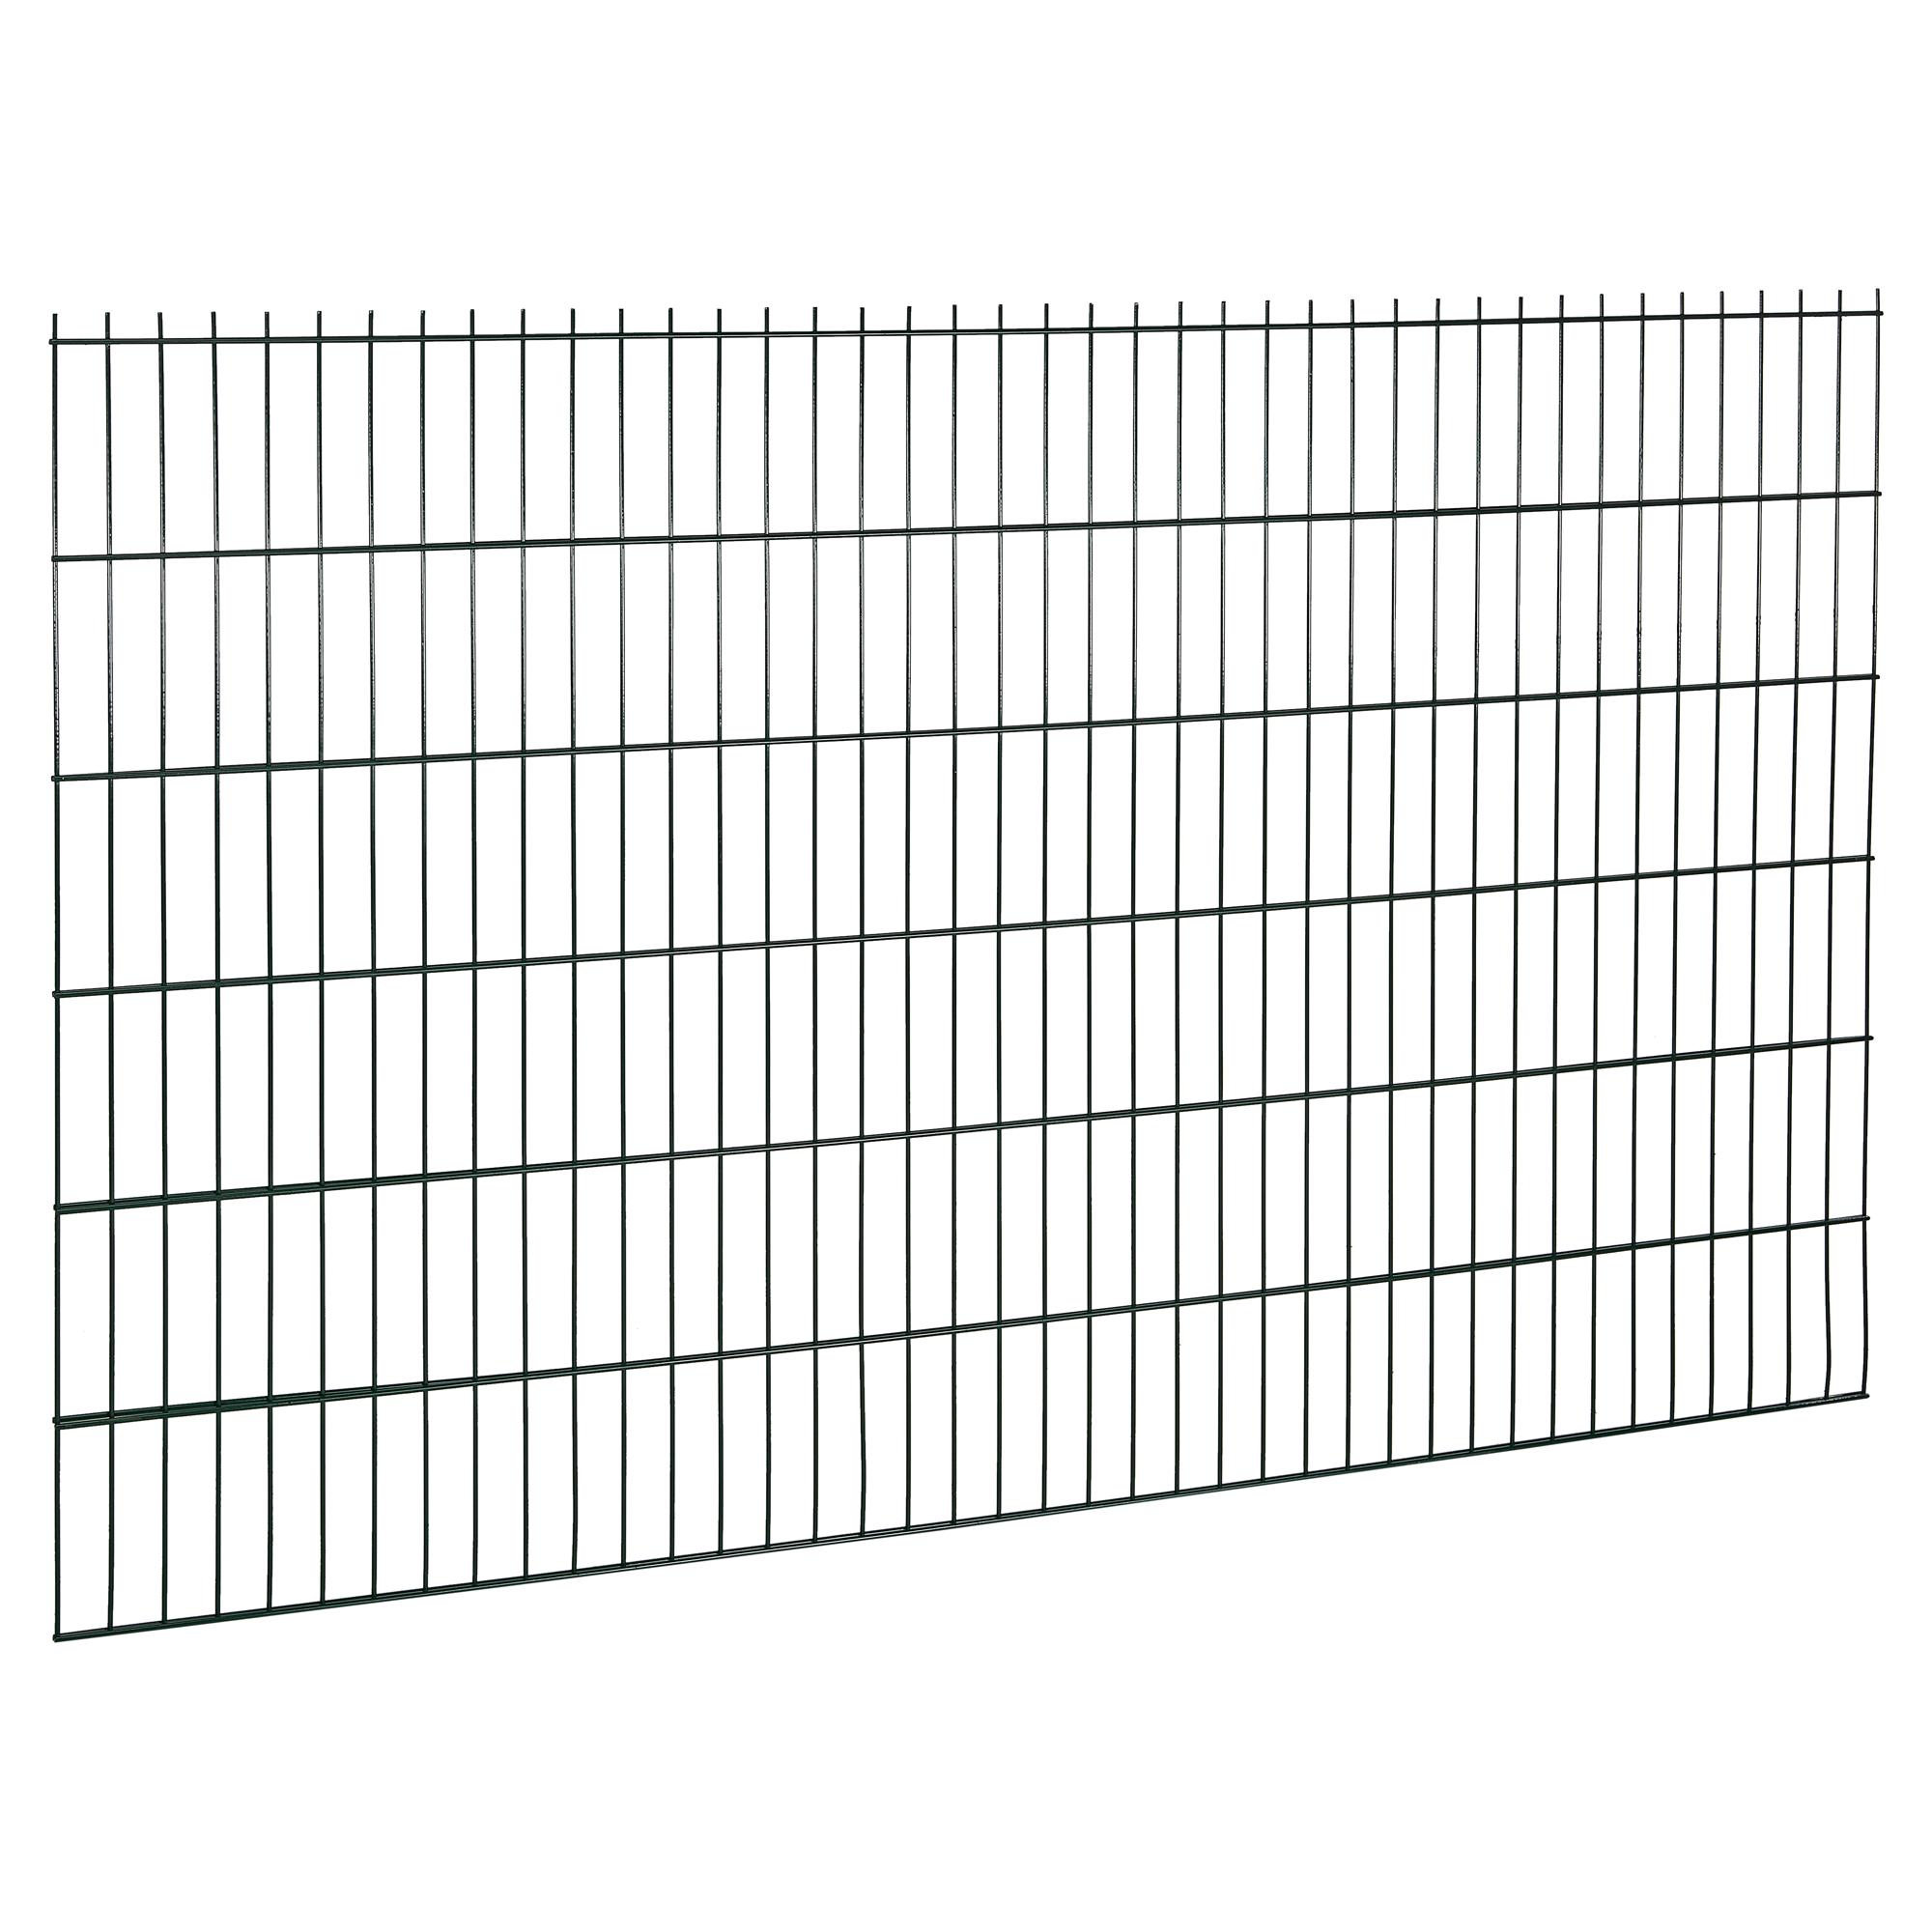 5 x Teichzaun Marienberg GRÜN Zaun Metall Zaunmatten Zierzaun Teichzäune Draht